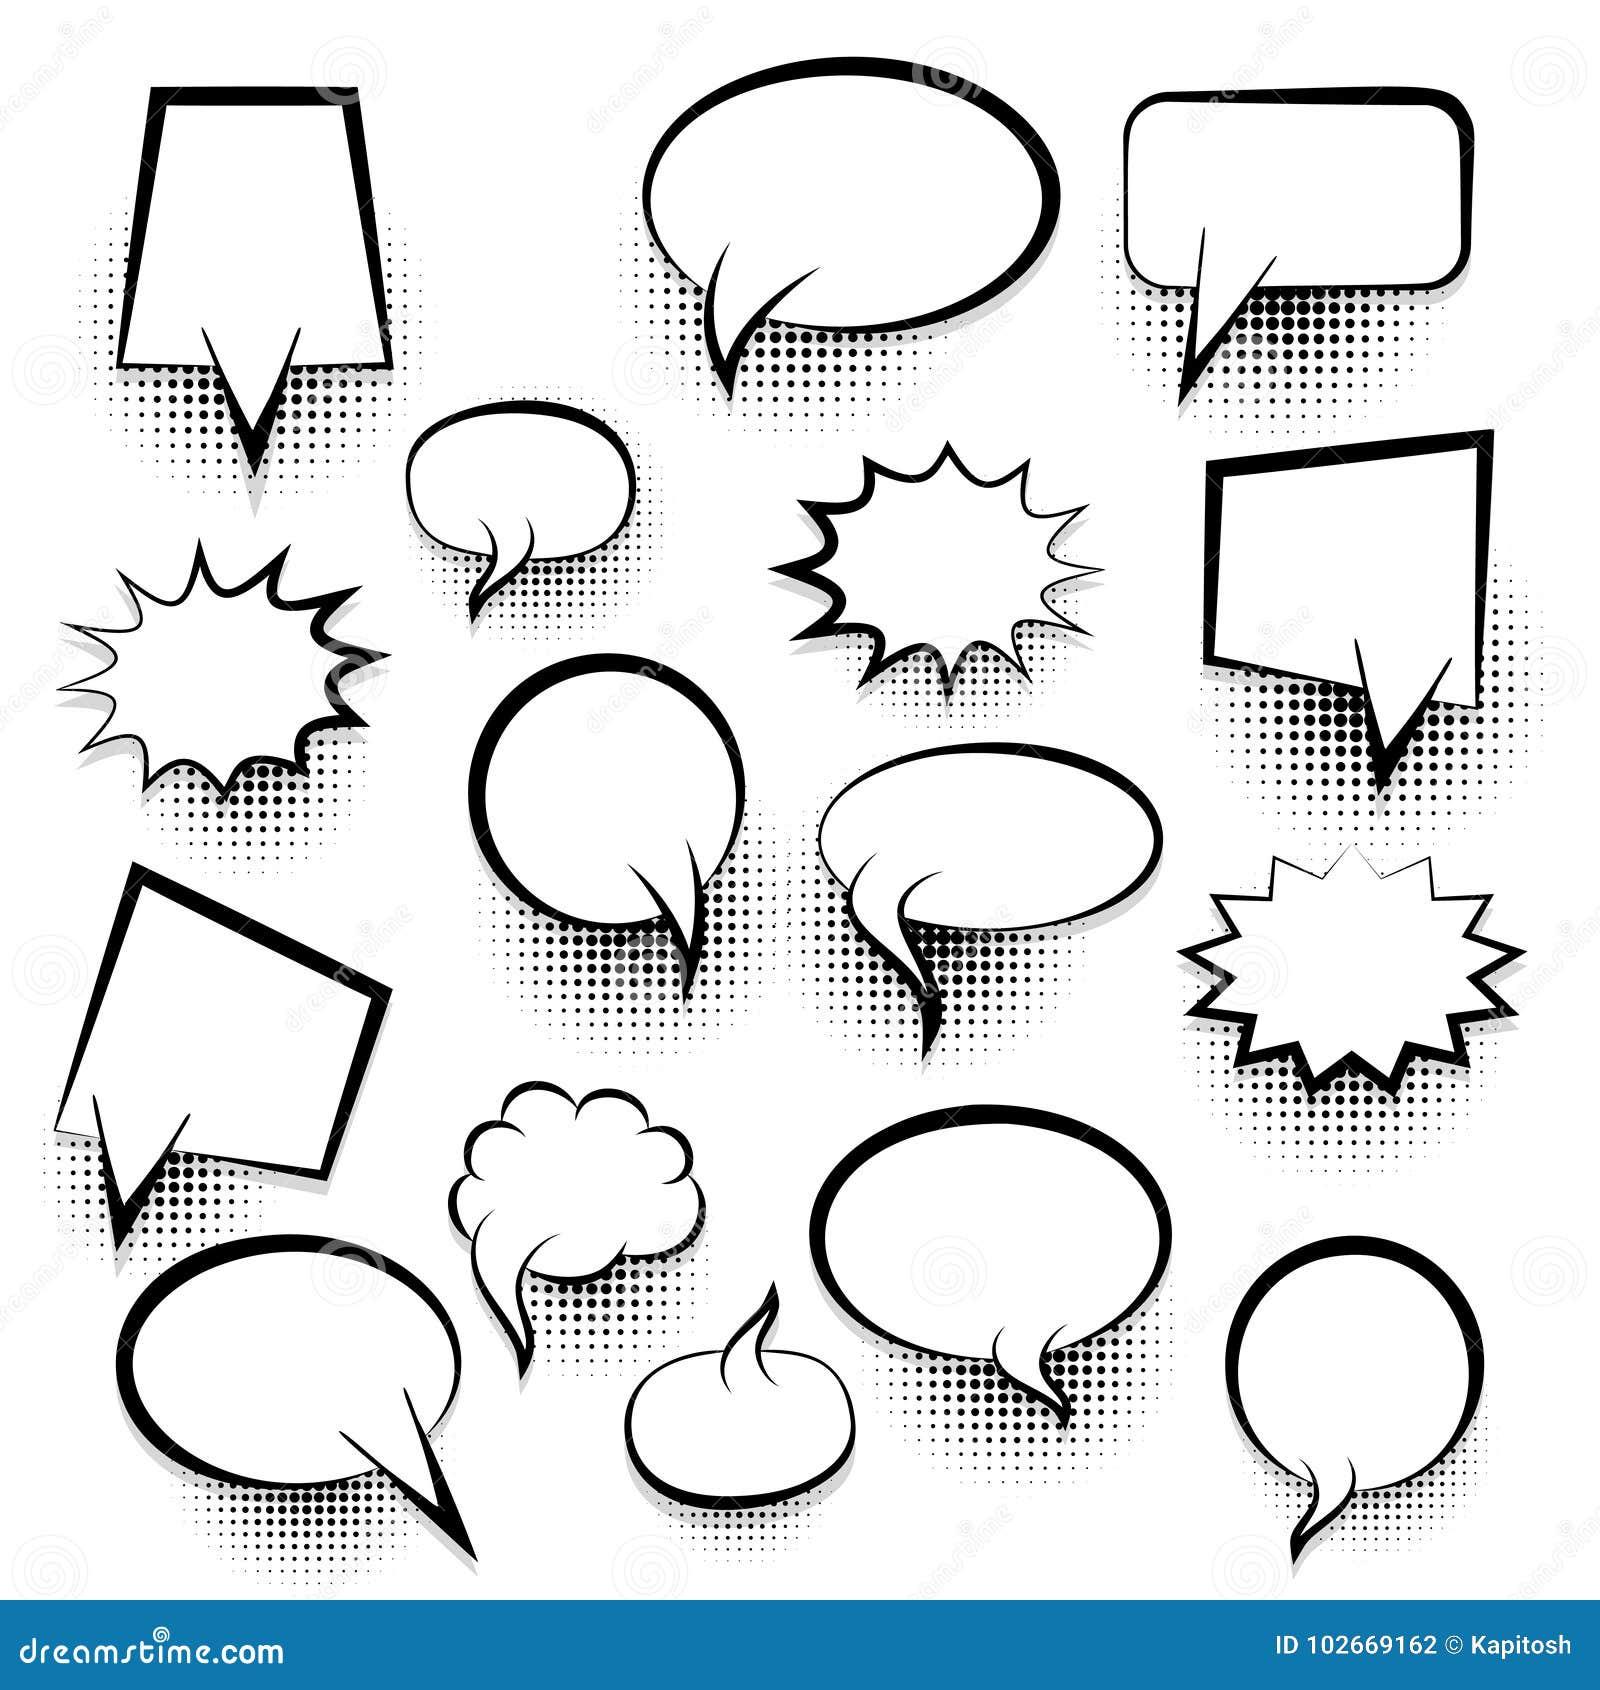 comic empty text speech bubble 25 stock vector illustration of